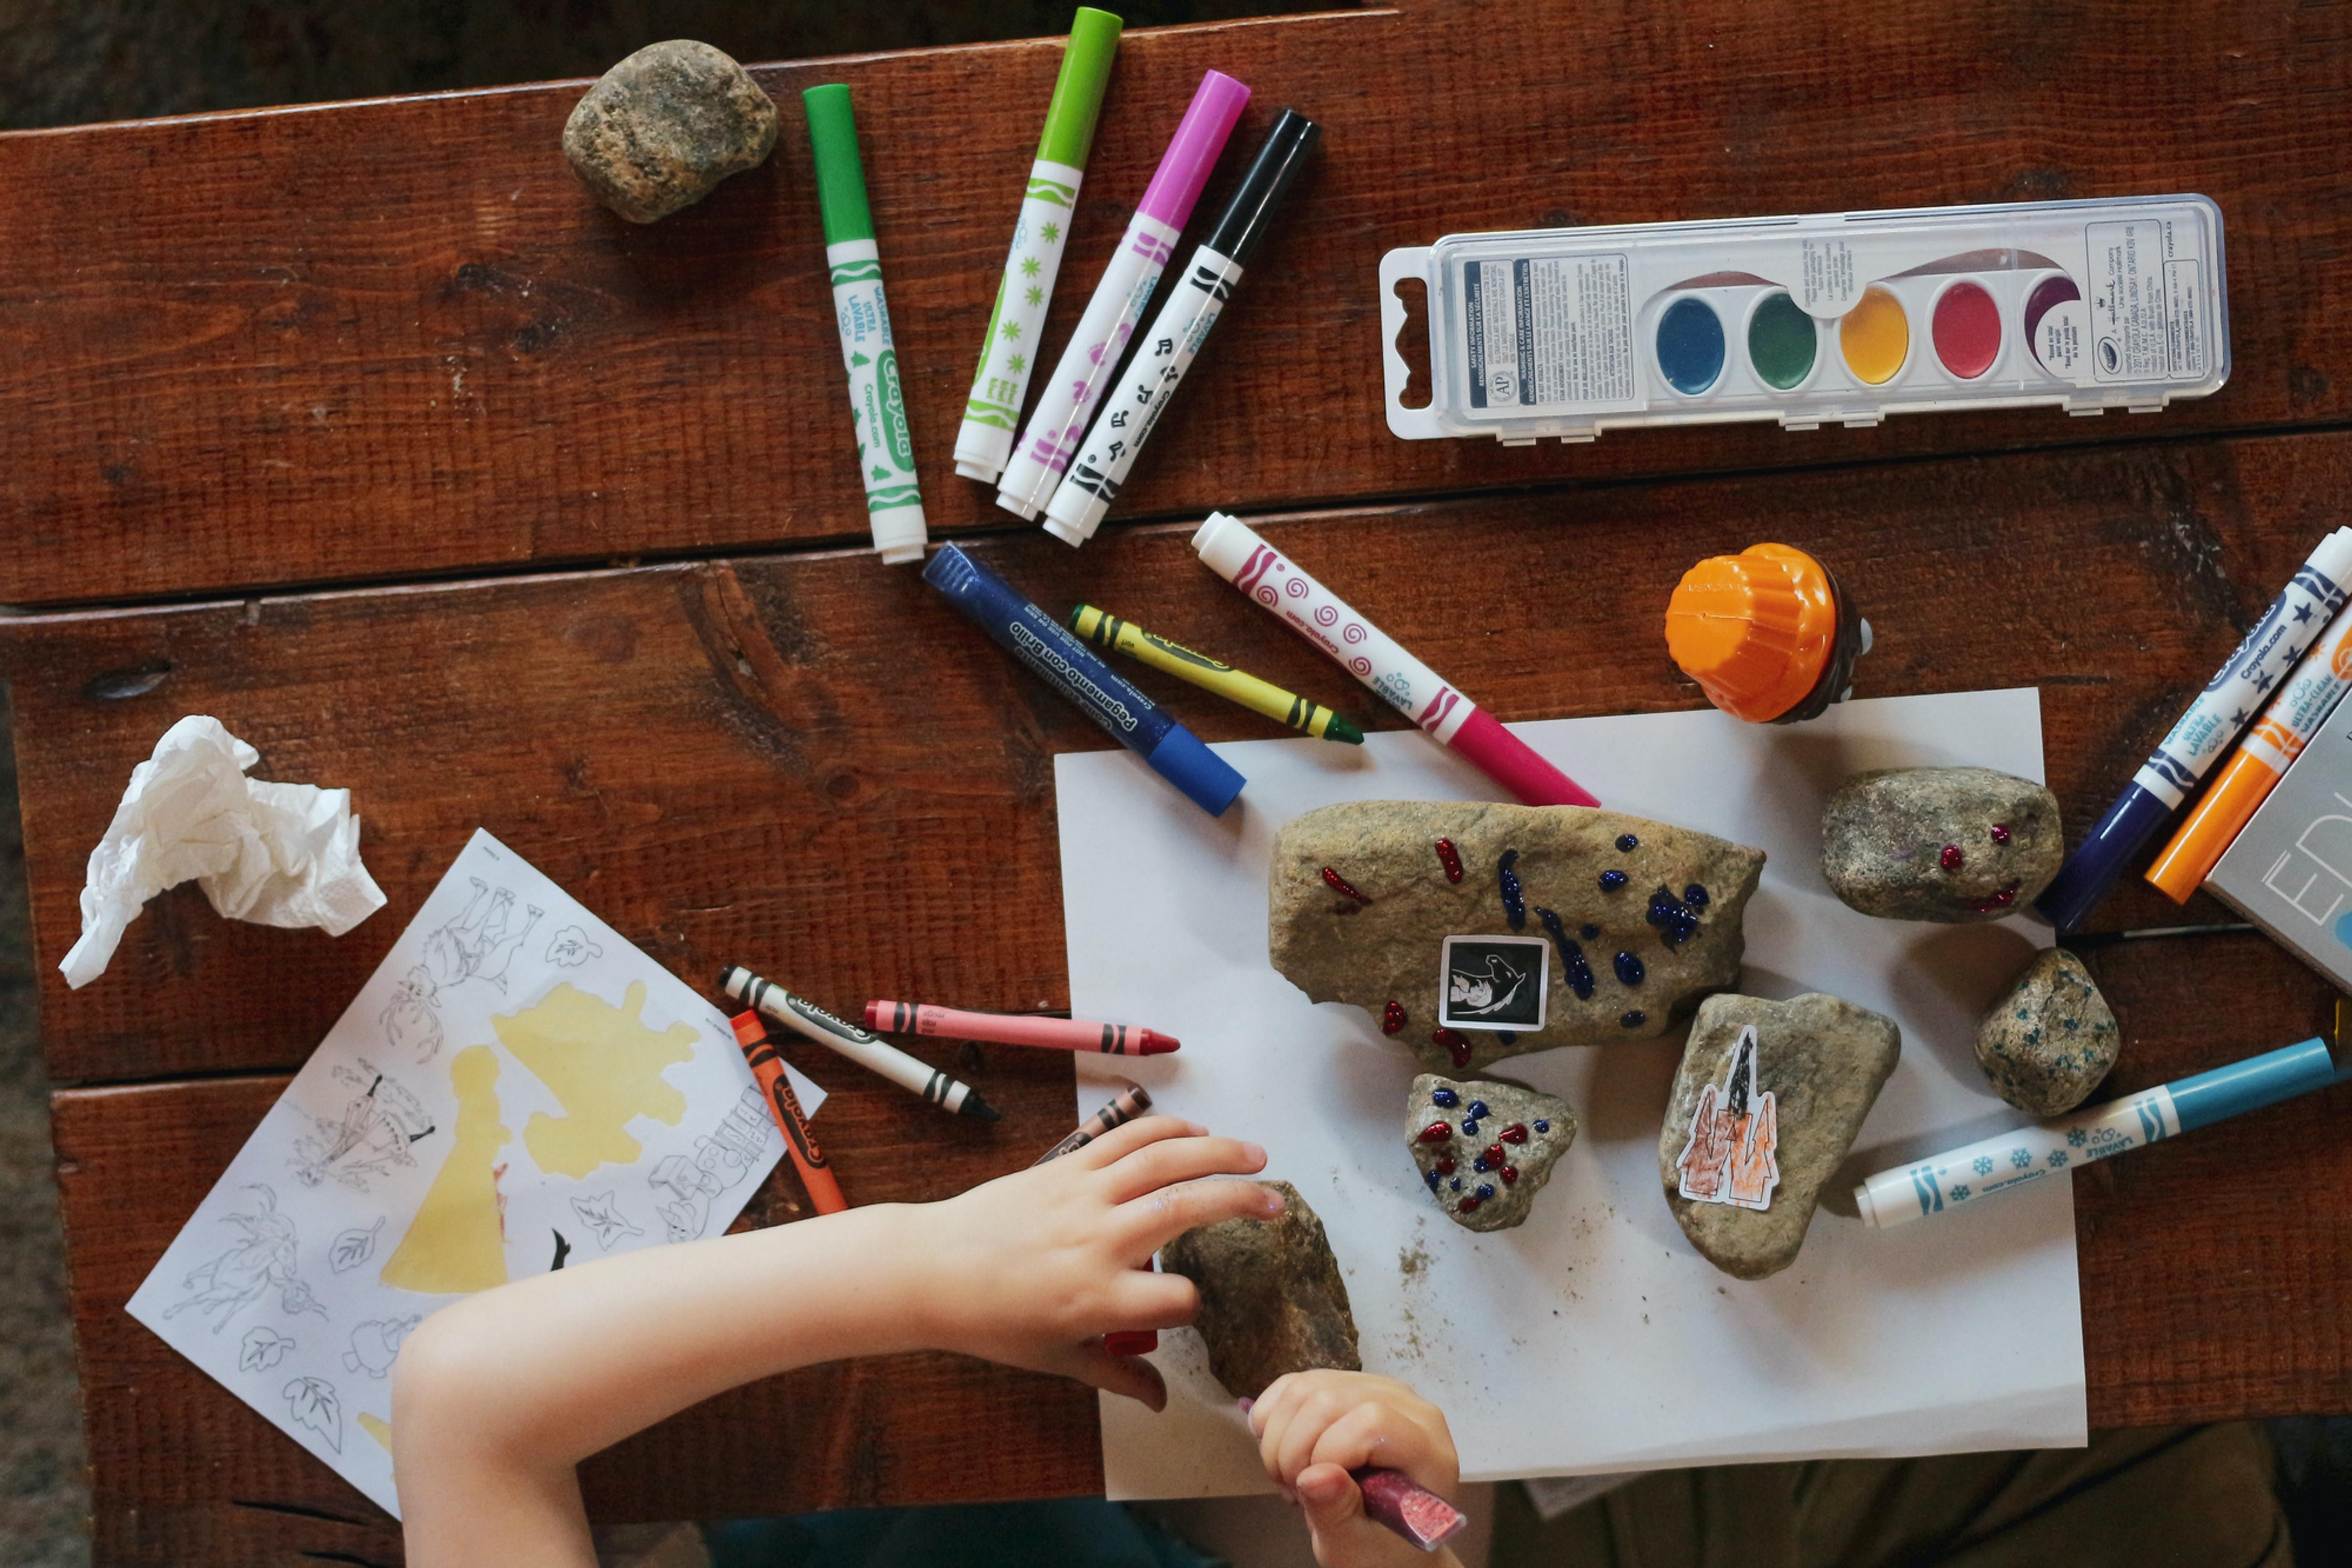 Child therapy consultation